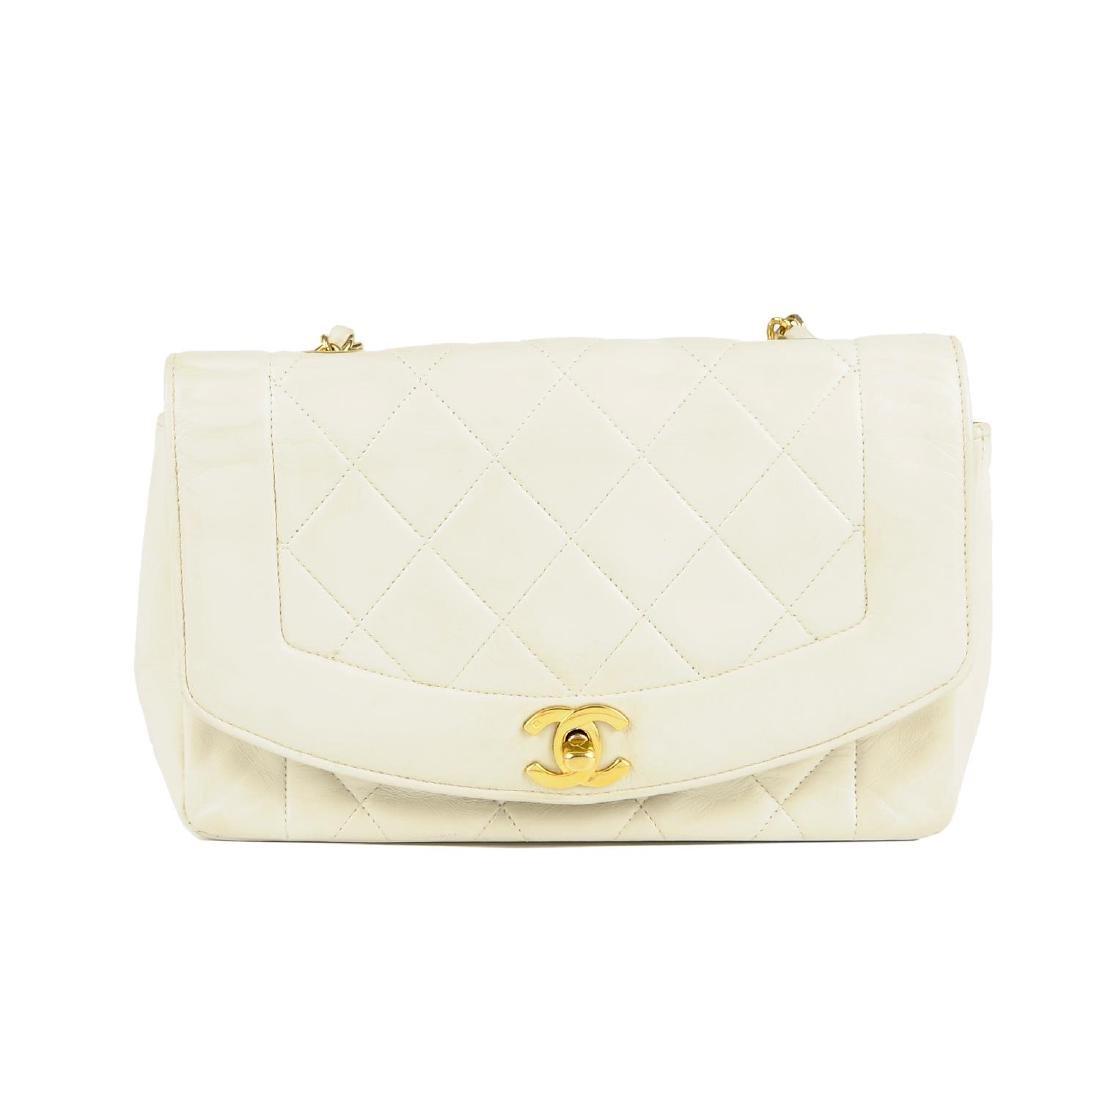 CHANEL - a vintage ivory lambskin leather handbag.